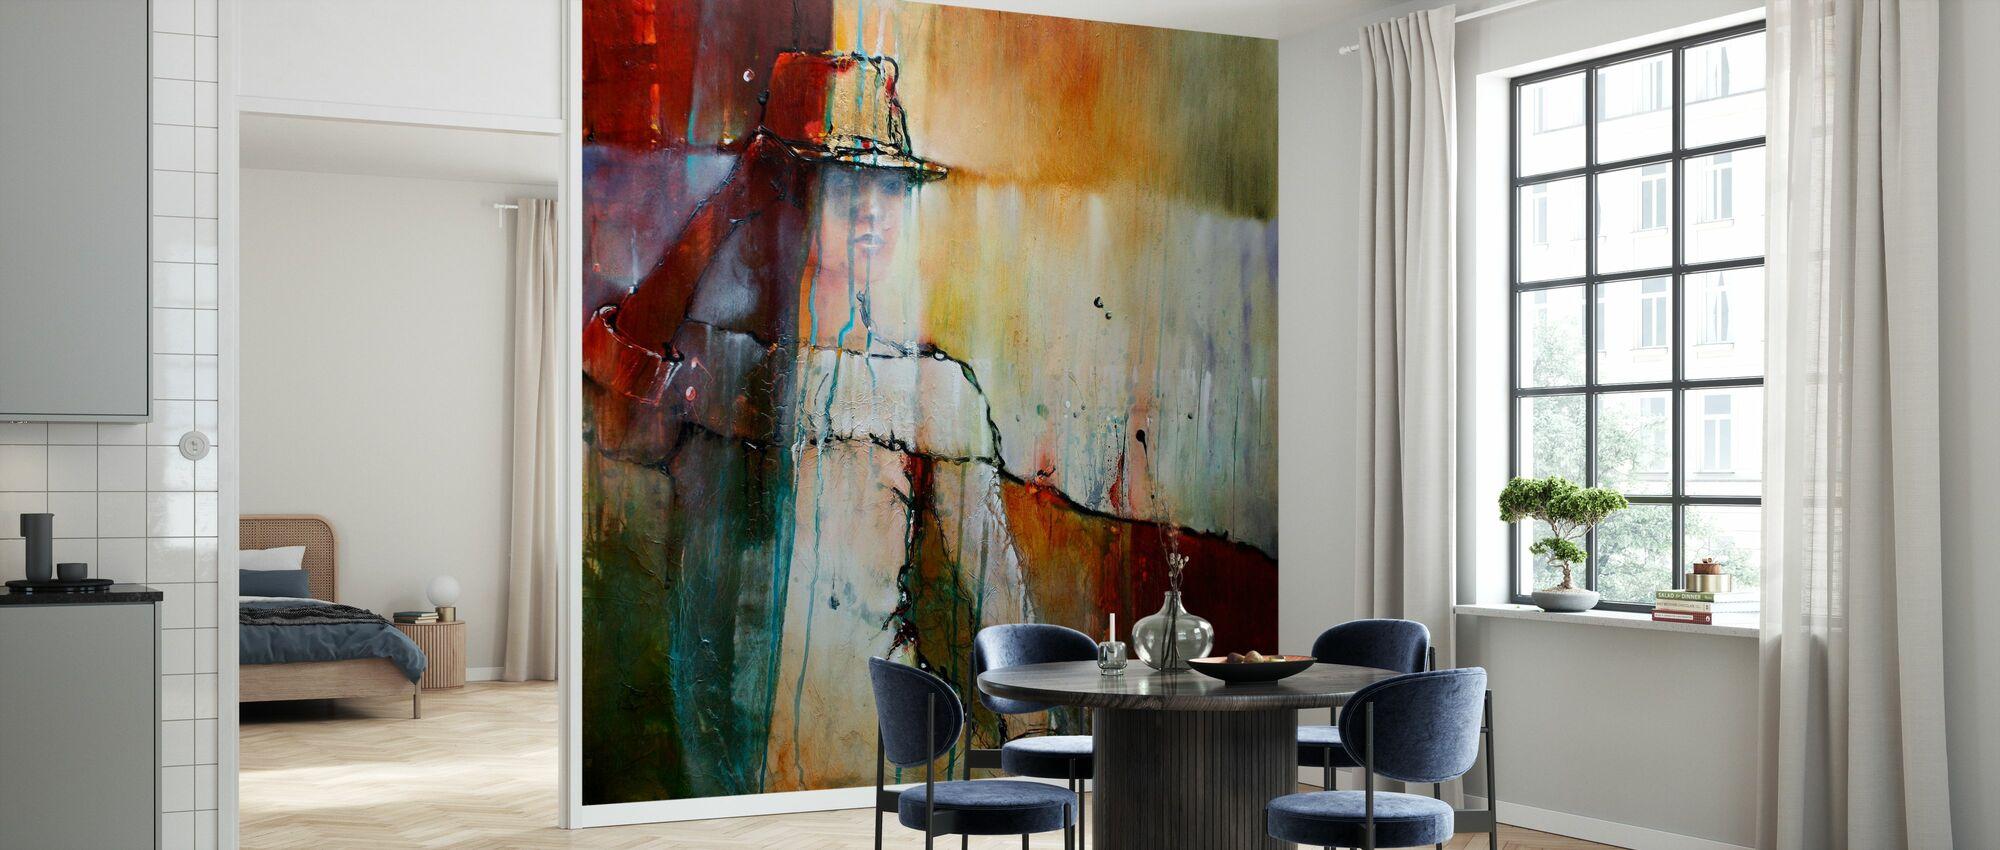 Elena with Hut II - Wallpaper - Kitchen